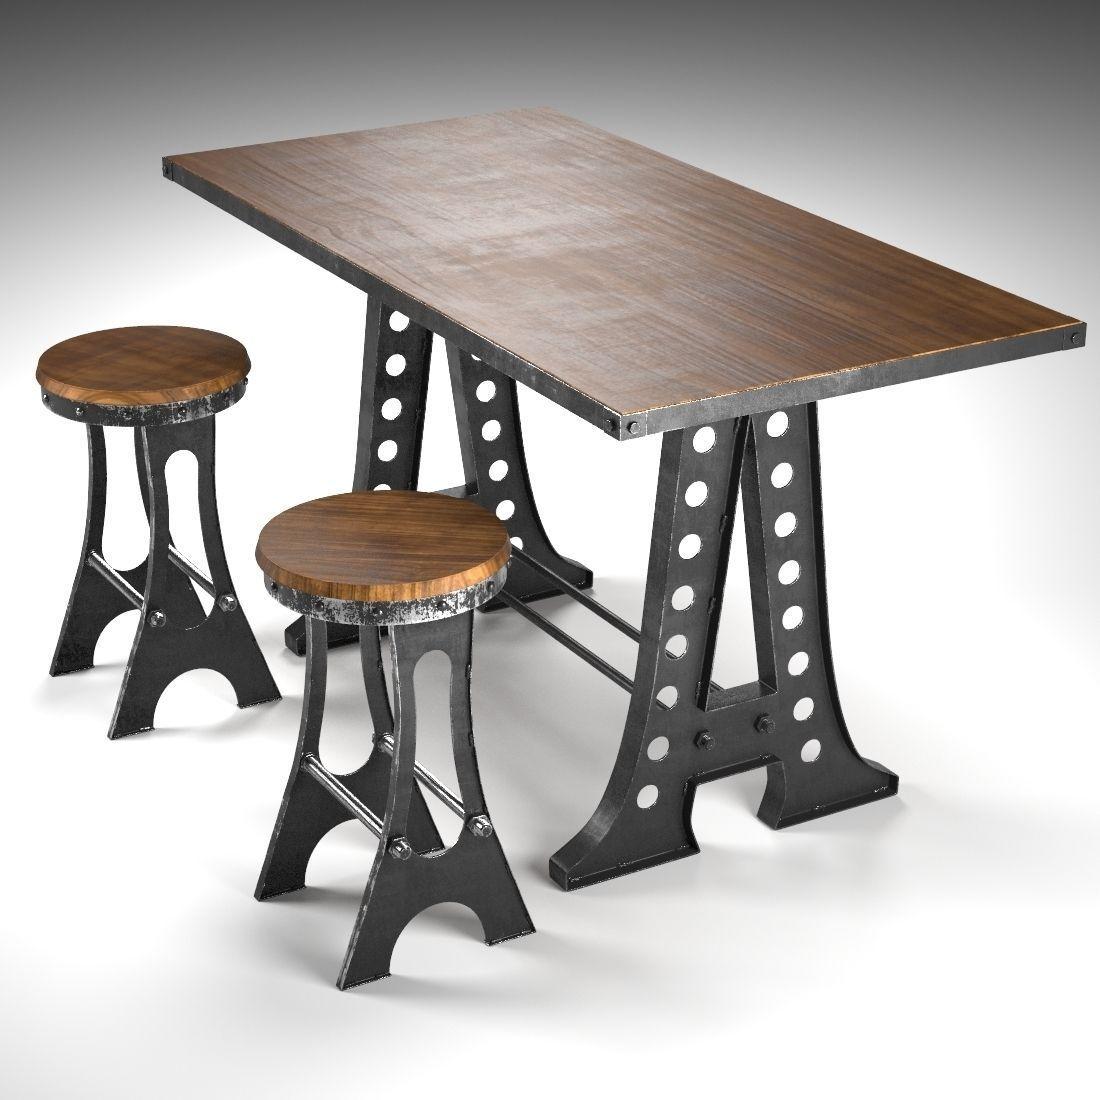 A frame dining table 3d model max obj fbx for Dining table frame